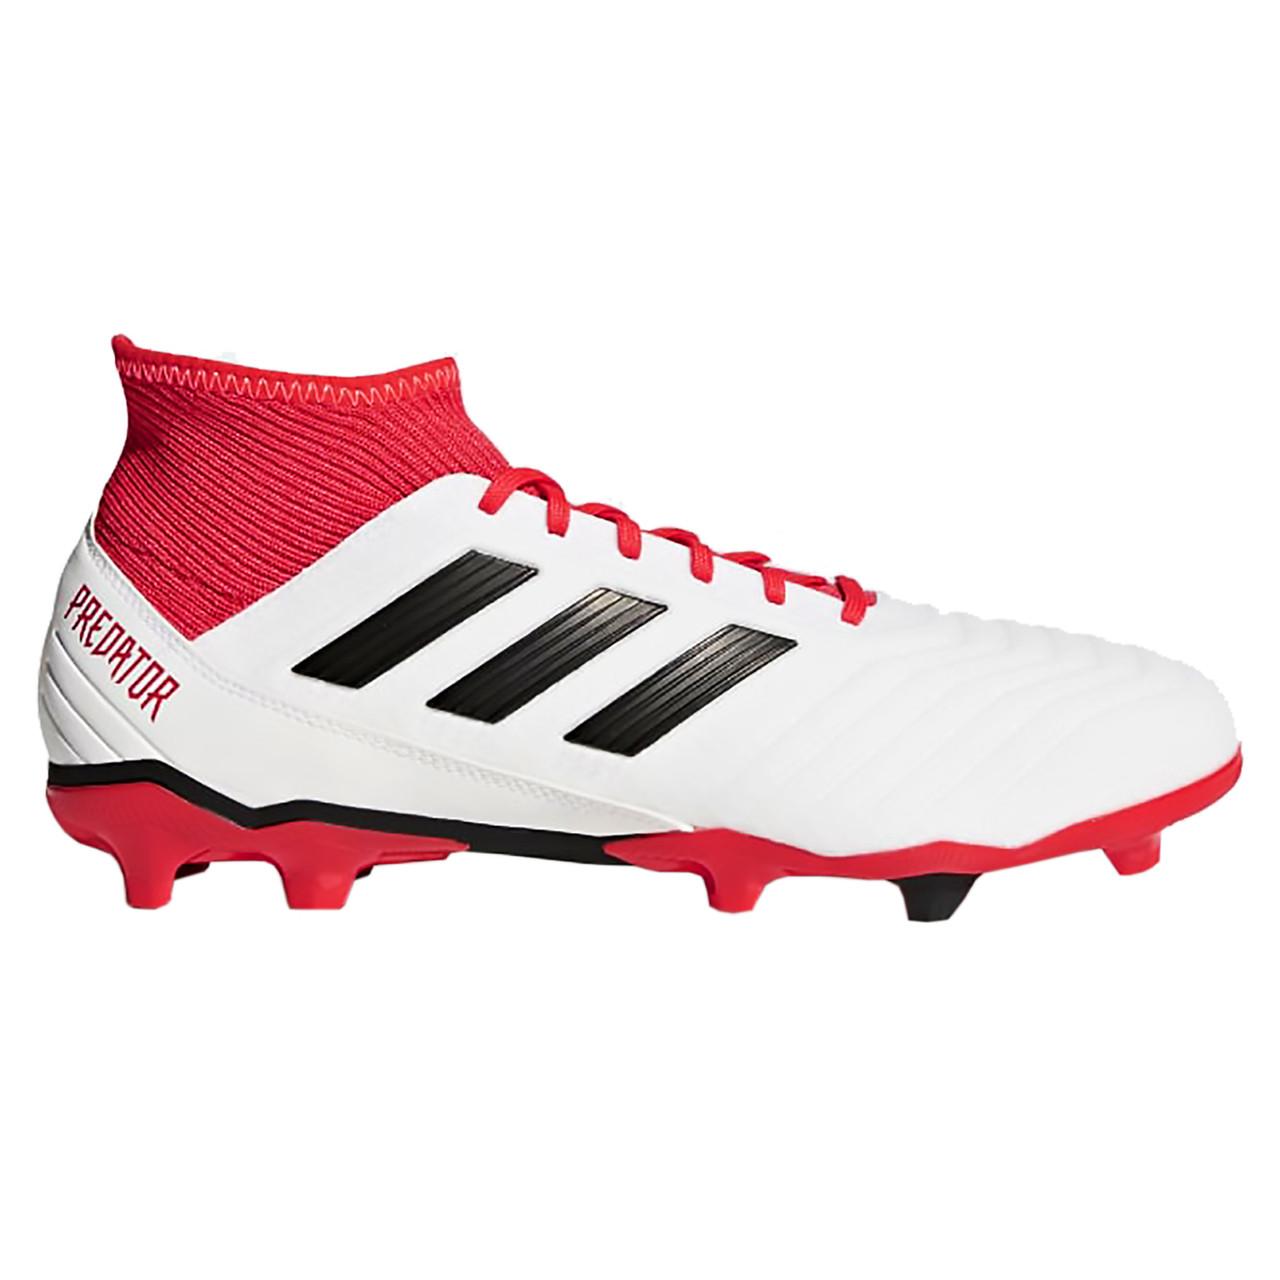 1b1d6383ee8 Adidas Predator 18.3 FG Men s Soccer Cleats CM7667 ...